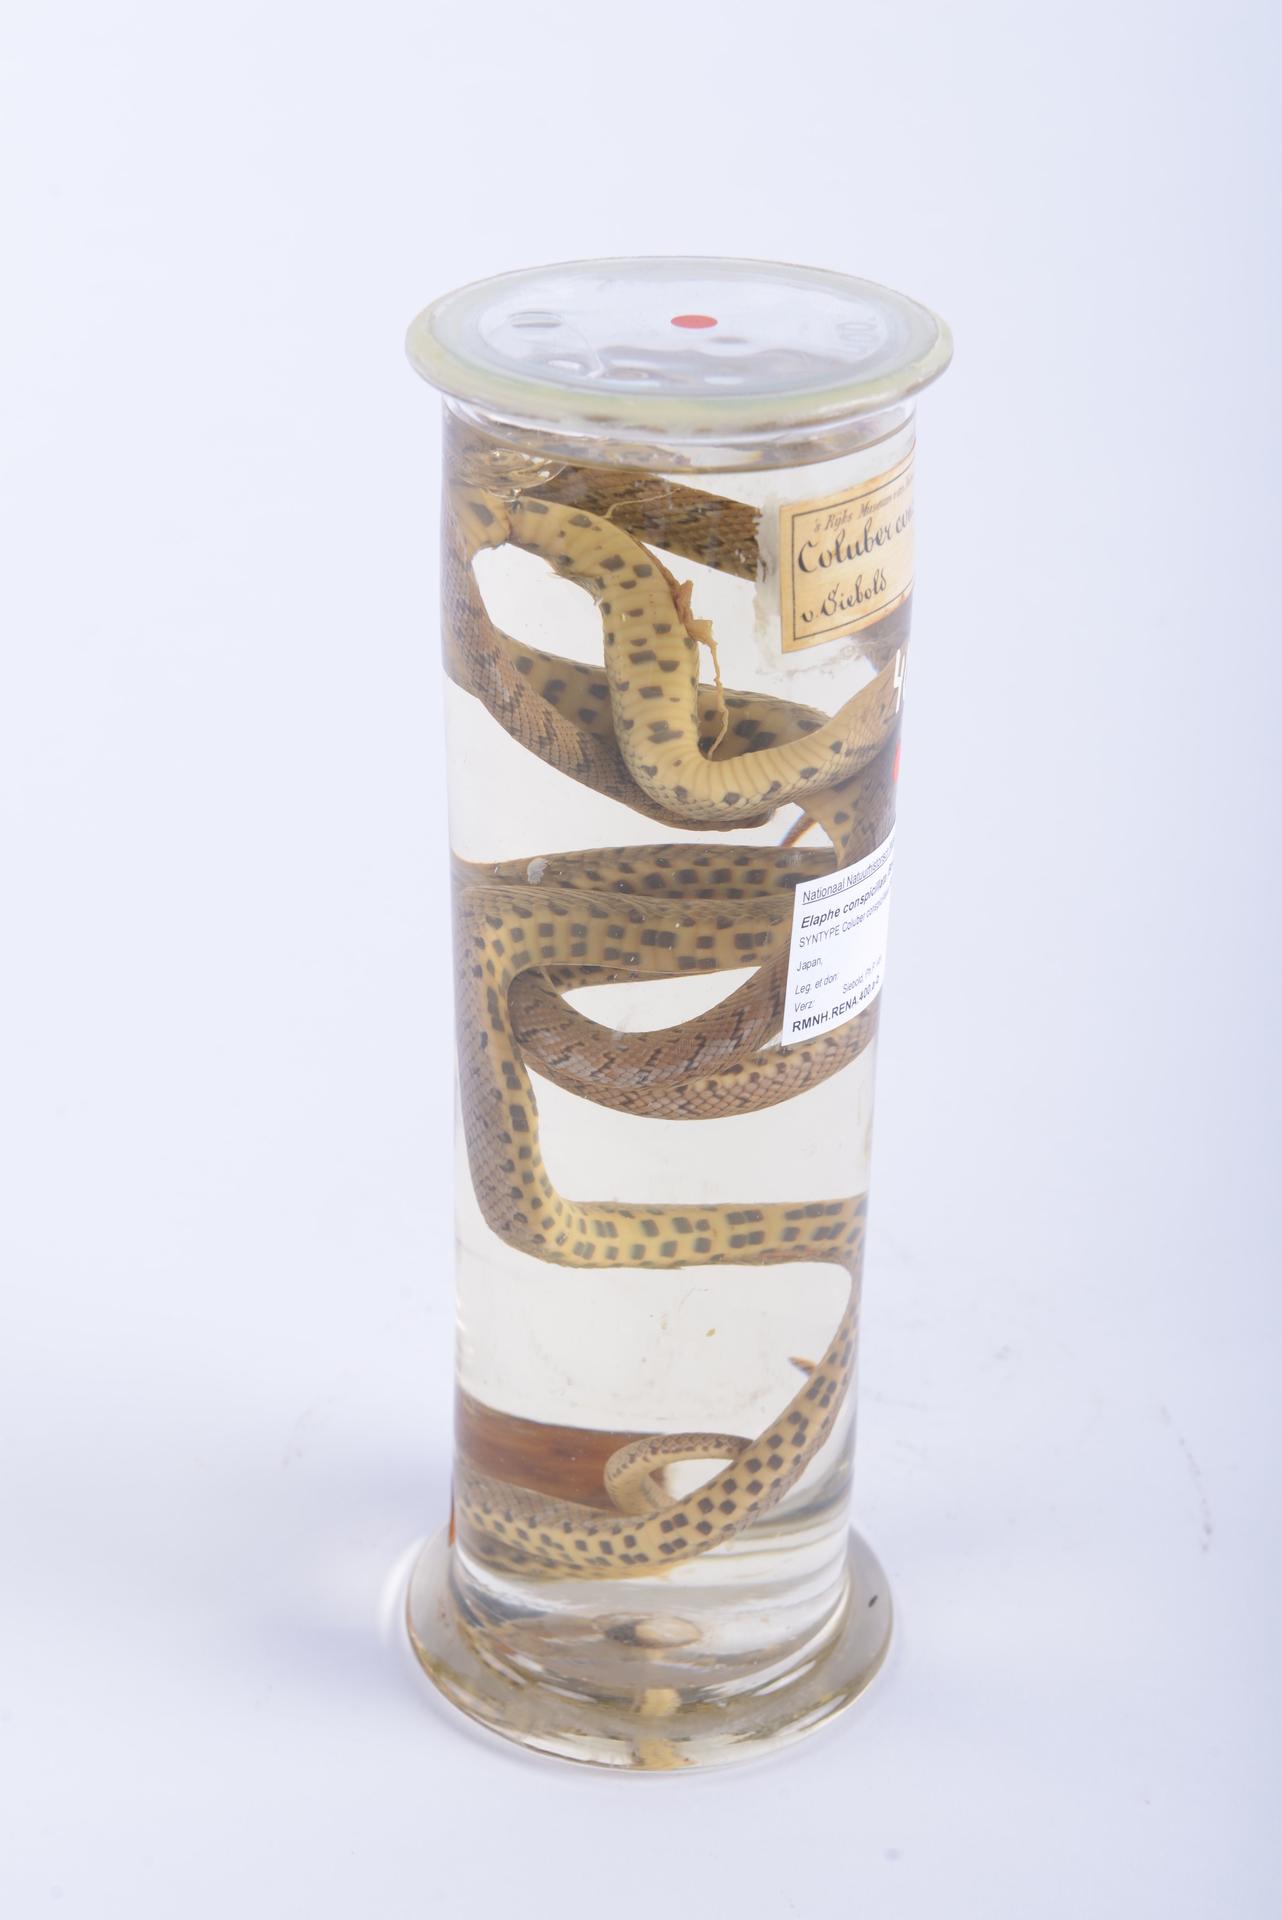 RMNH.RENA.400.a | Elaphe conspicillata (Boie, 1826)